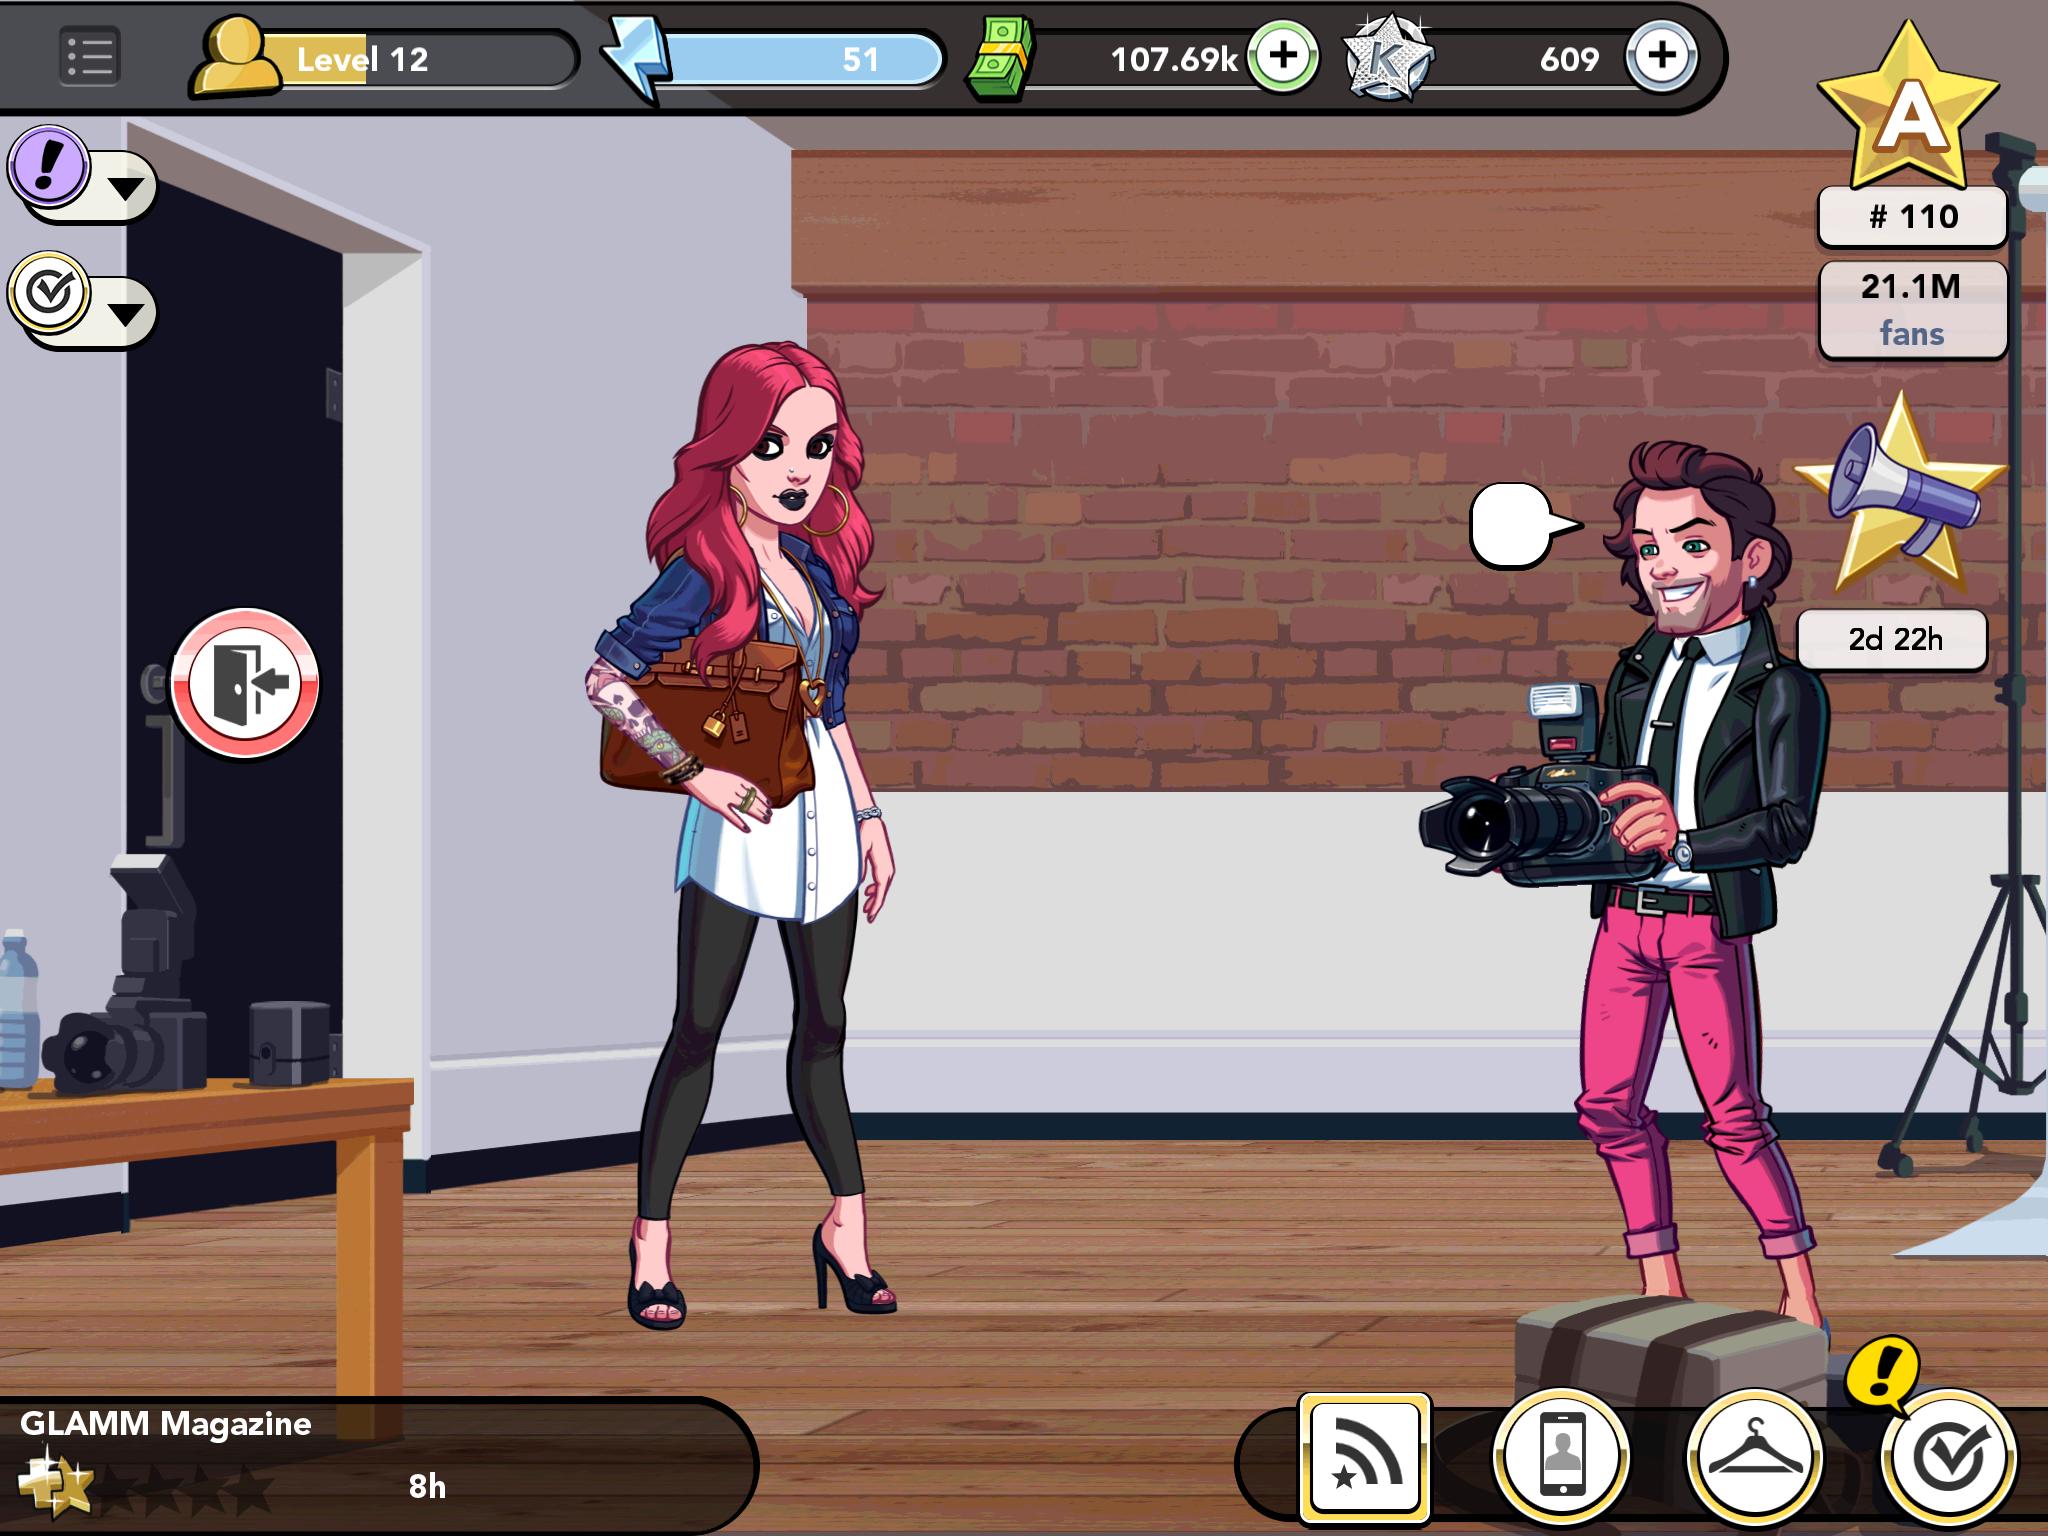 hermes inspired handbags - The app with the Birkin bag: So, I played Kim Kardashian Hollywood ...